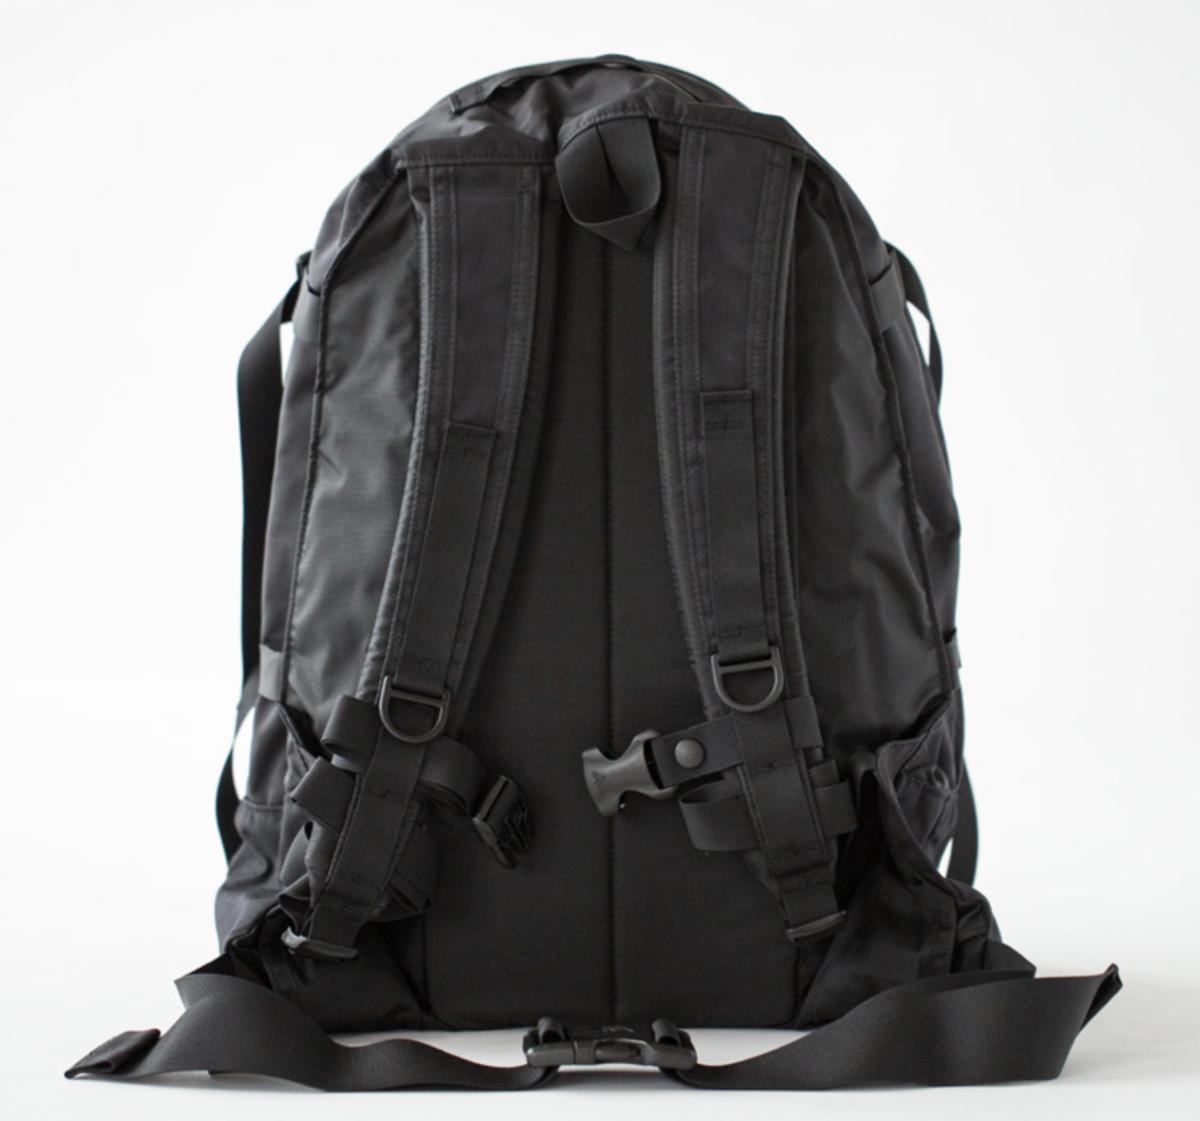 f:id:thebackpack:20191005185937p:plain